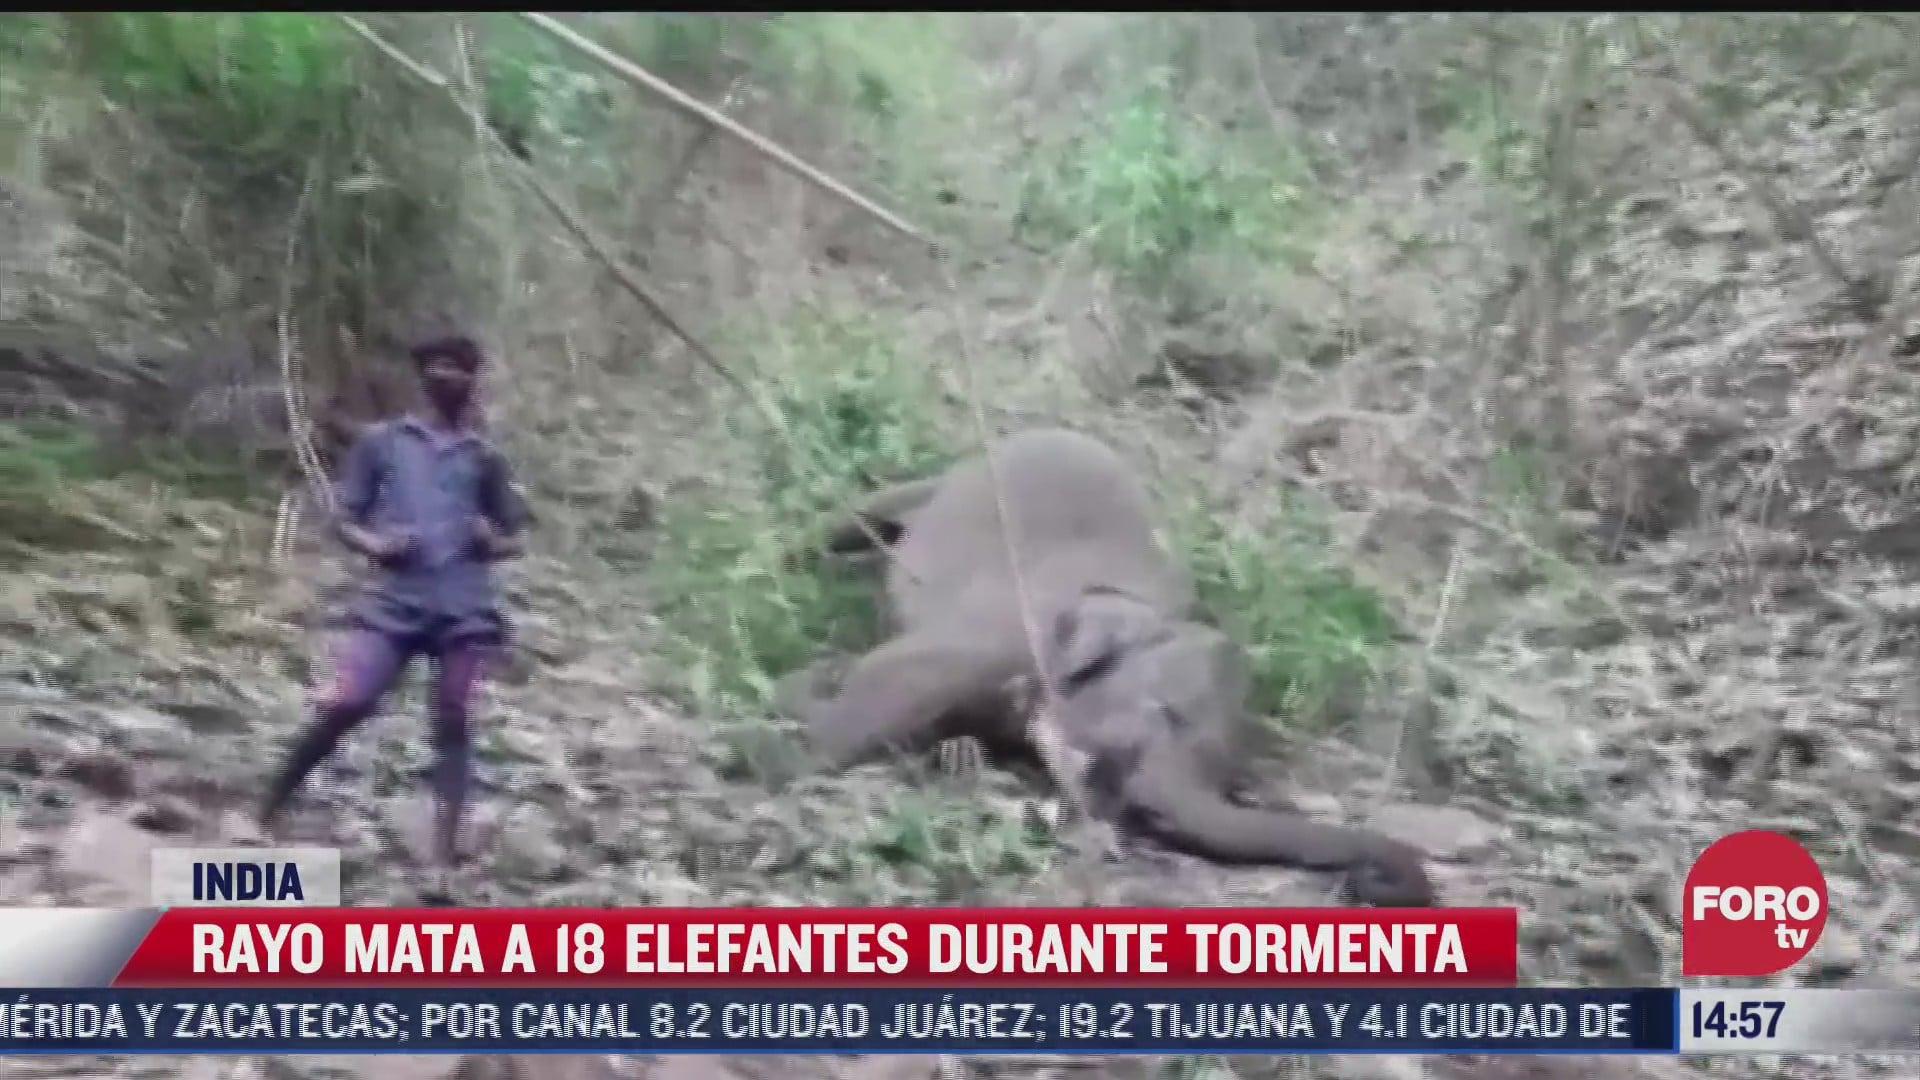 rayo mata a 18 elefantes en la india